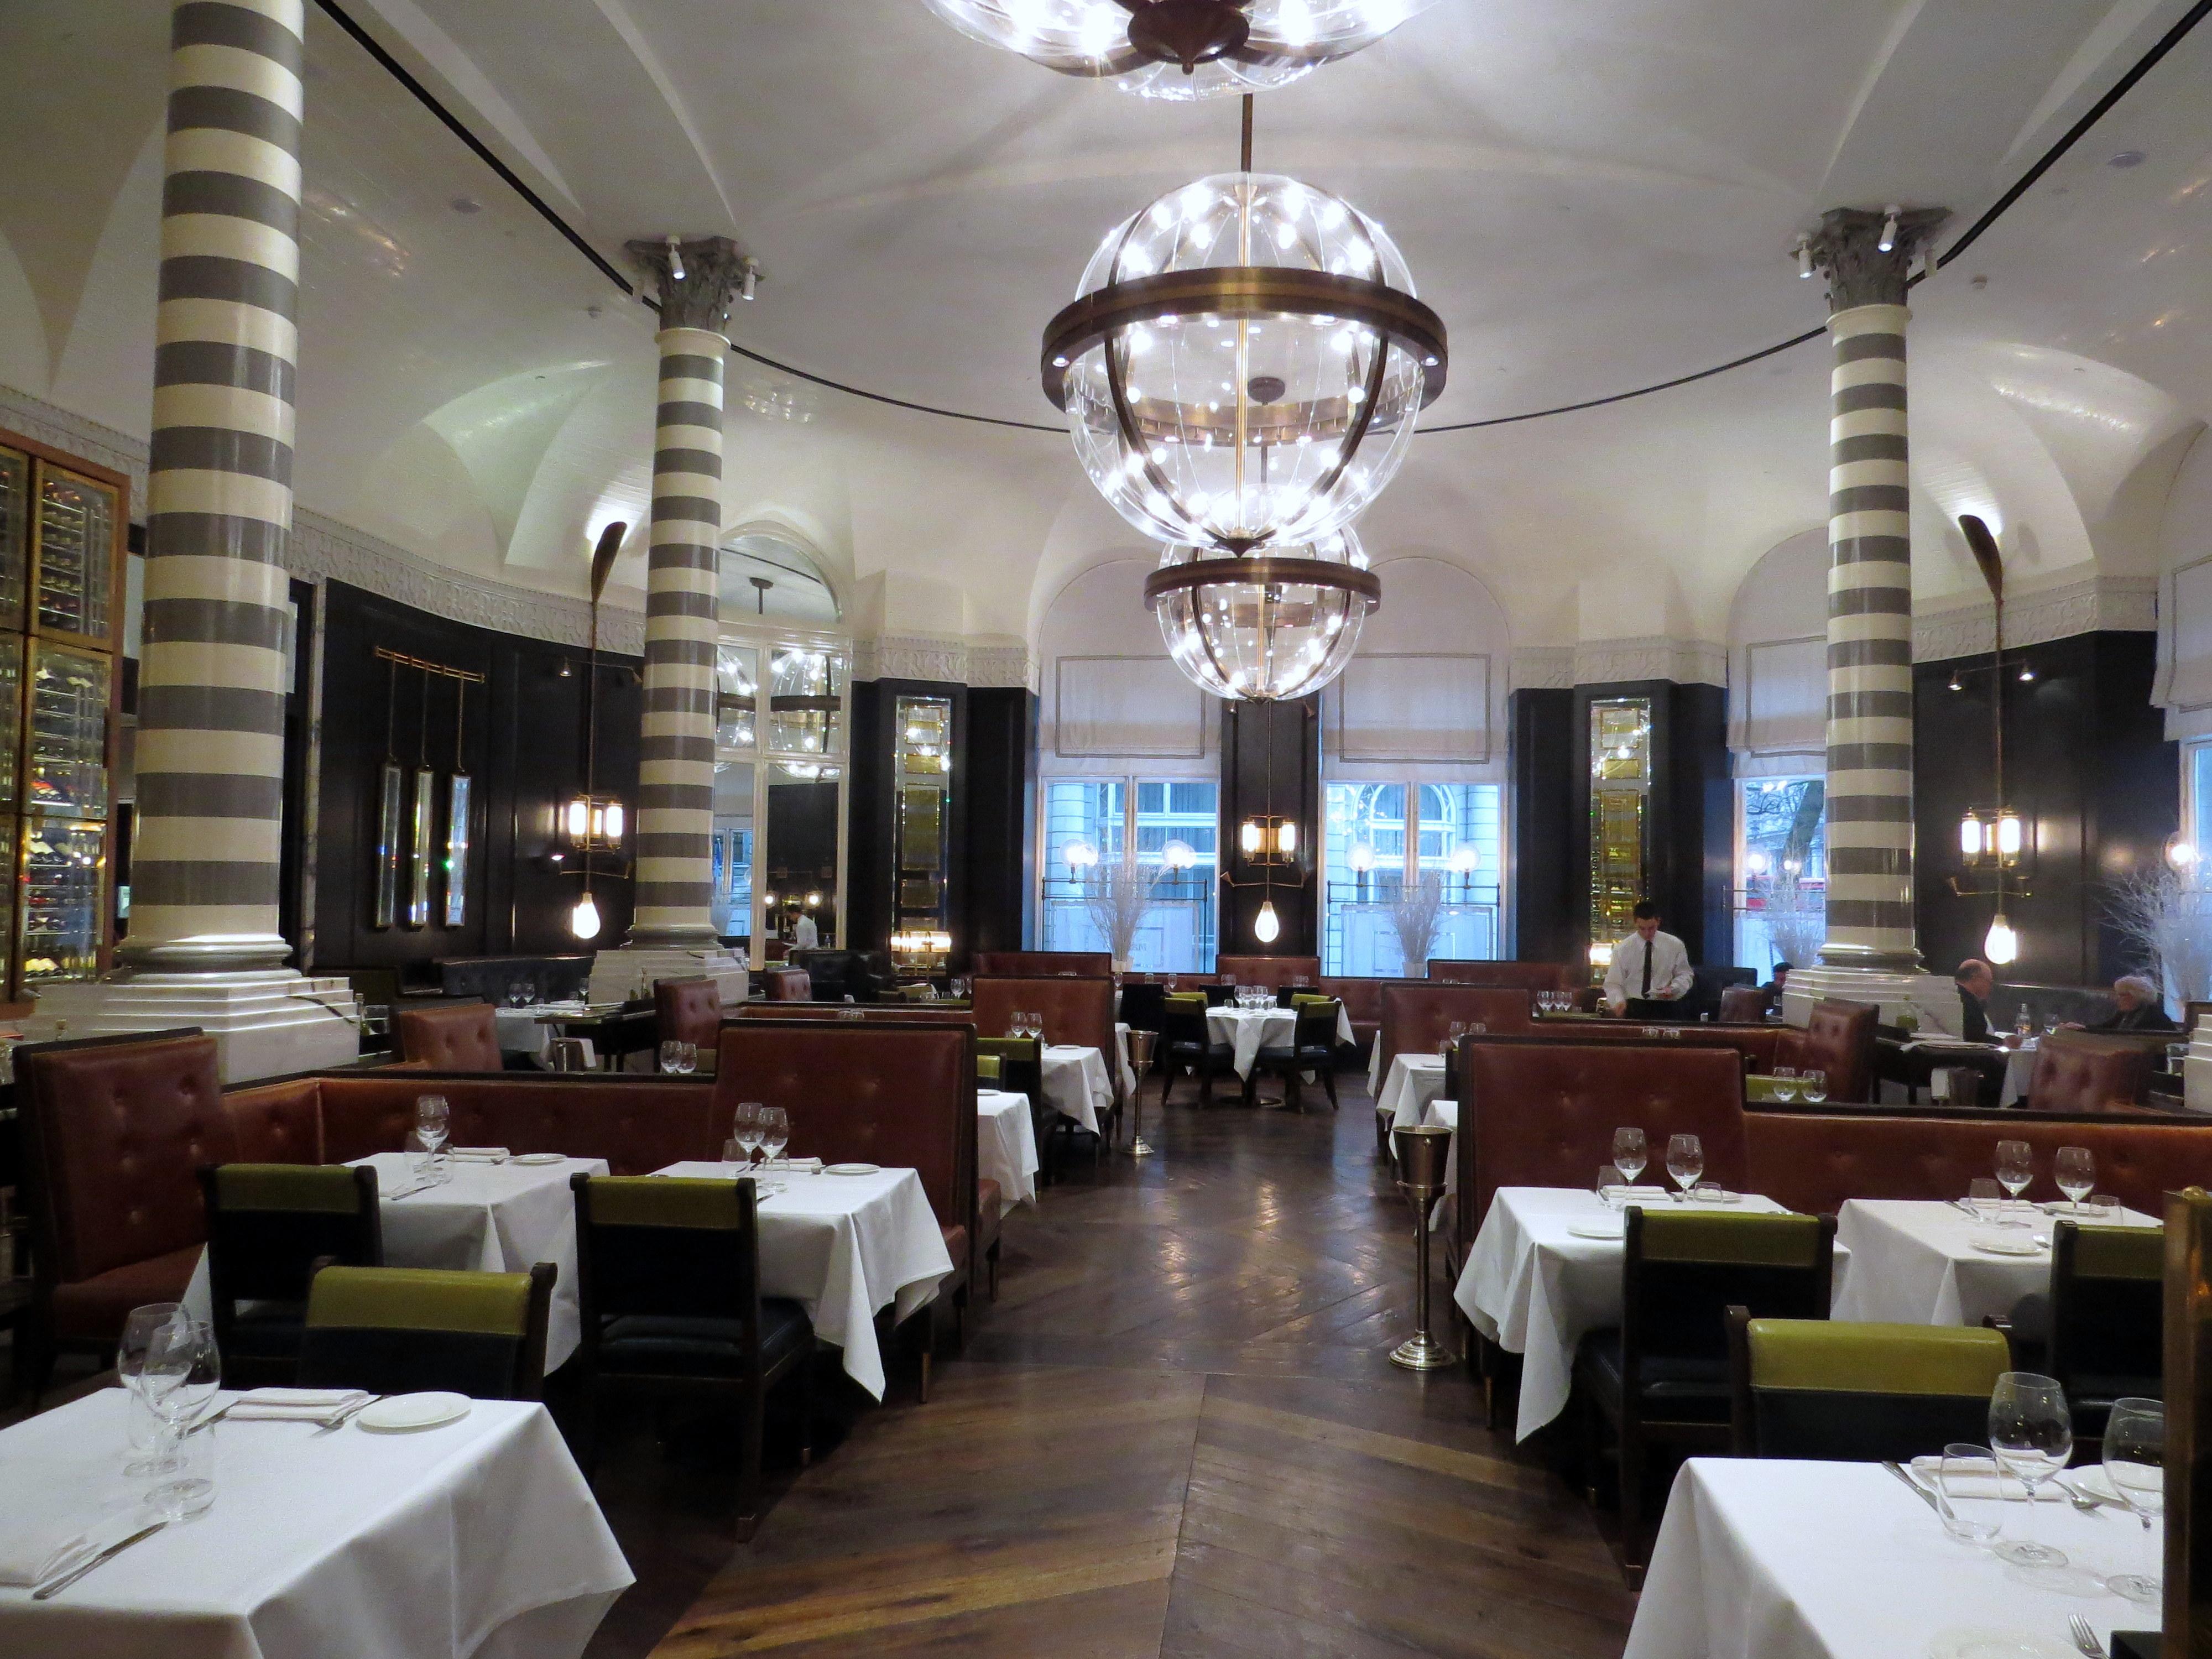 new club restaurant inclusions design restaurants. Black Bedroom Furniture Sets. Home Design Ideas